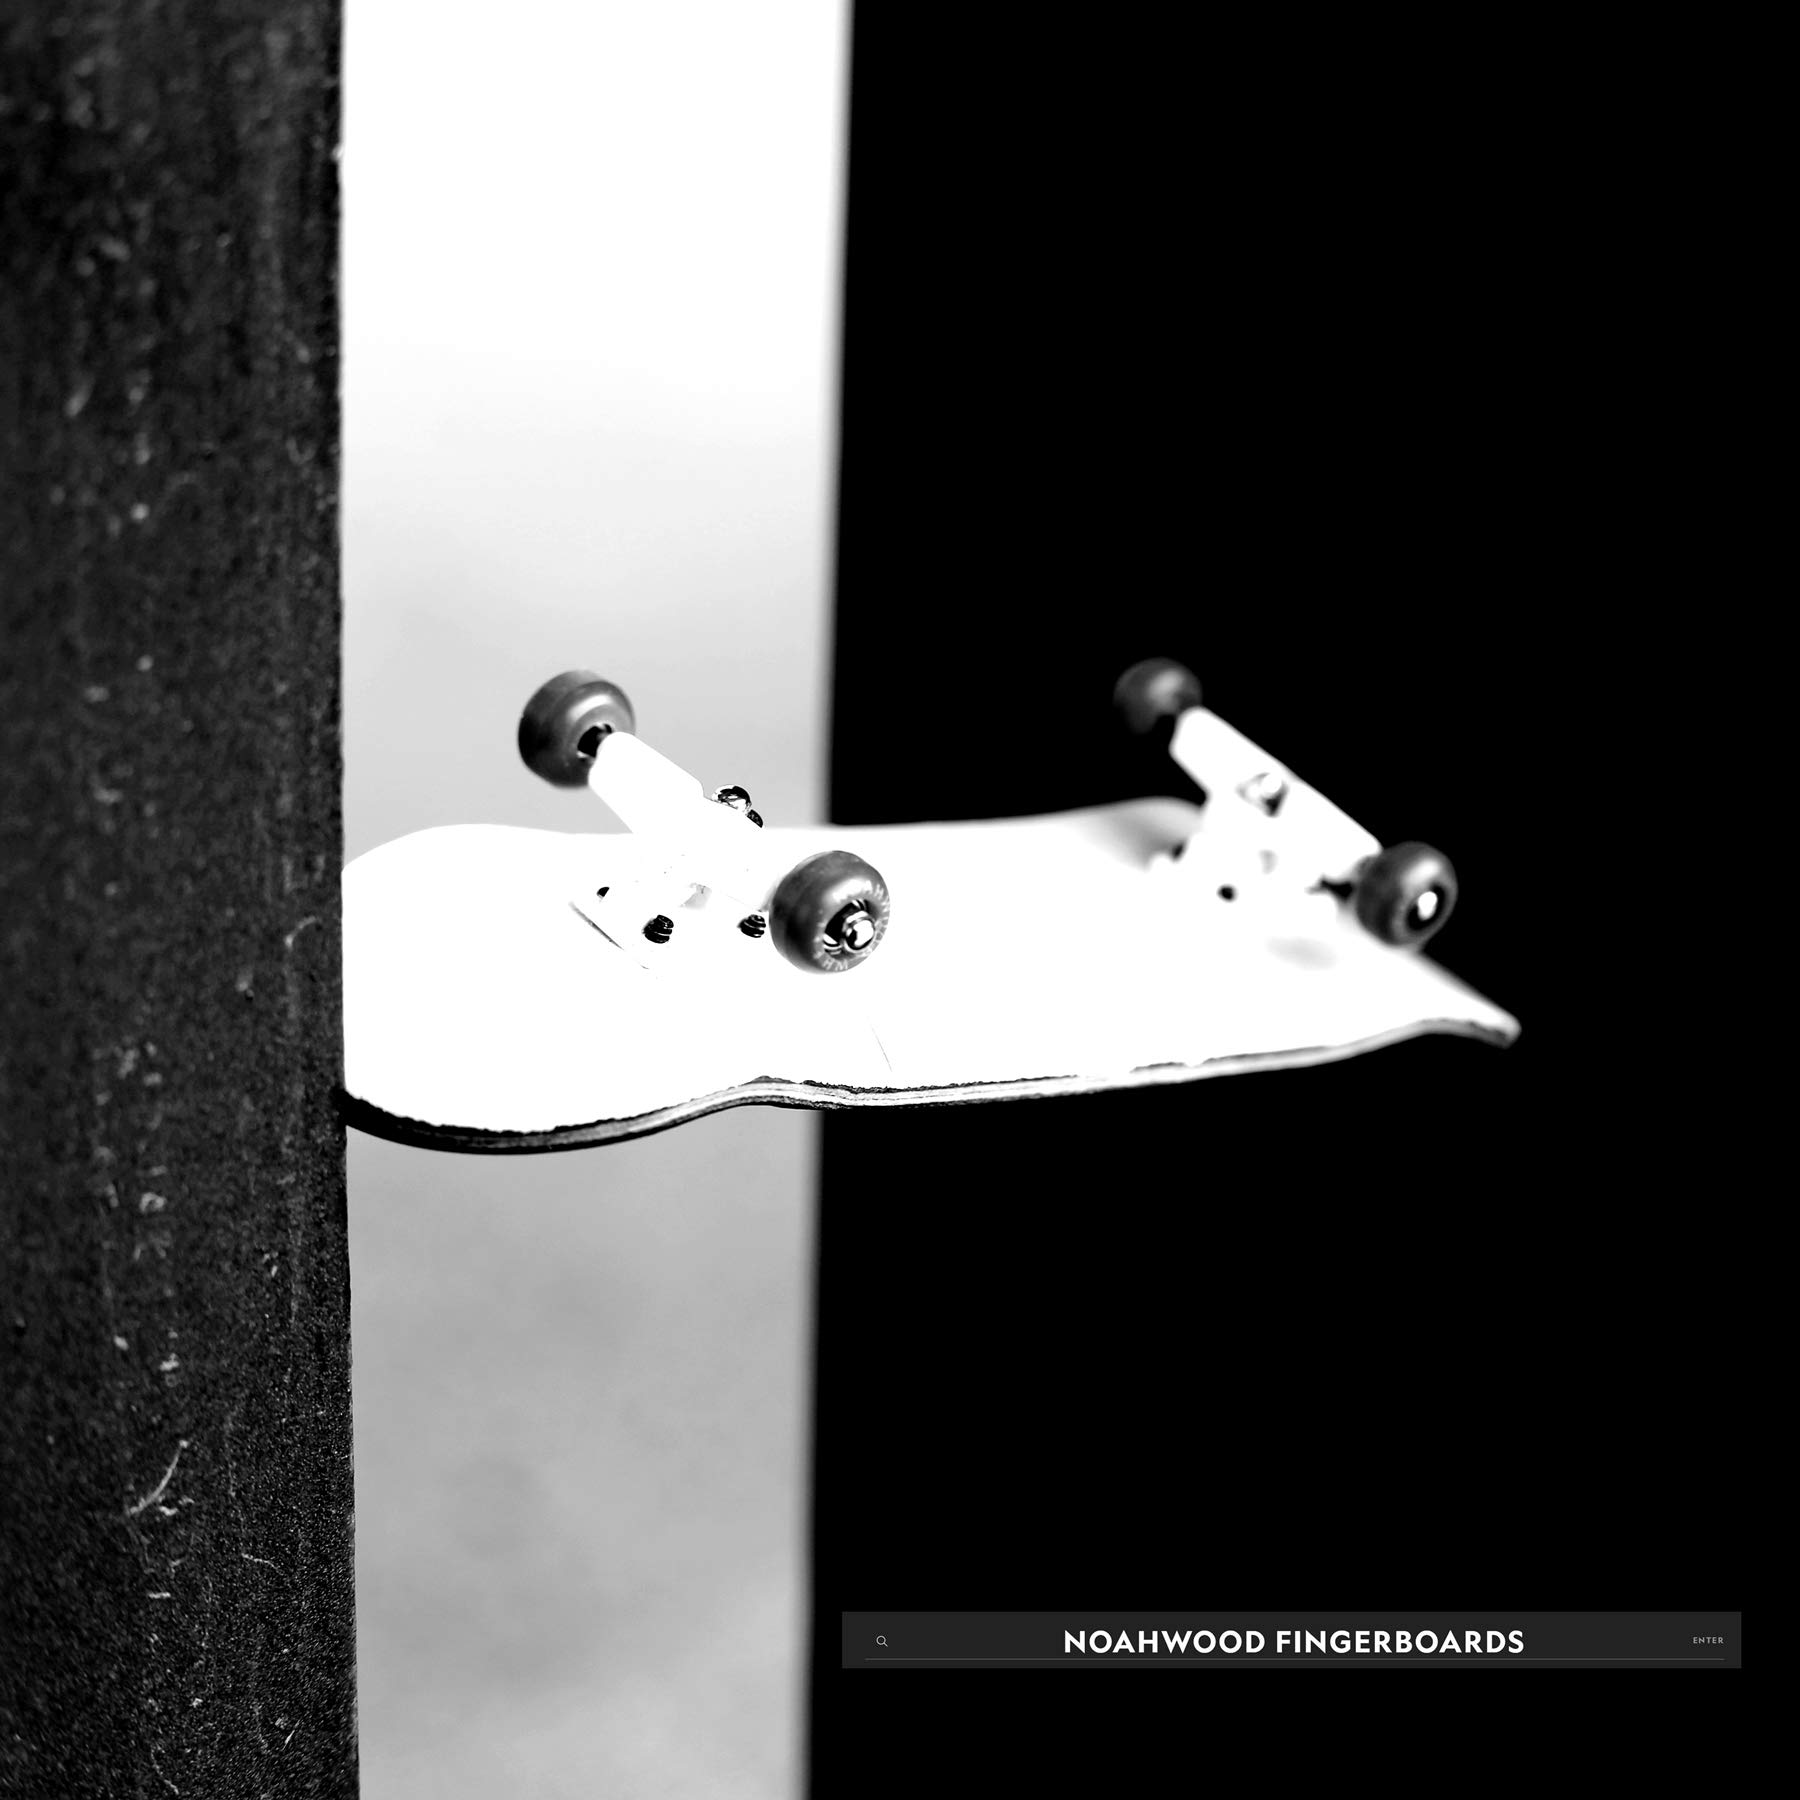 NOAHWOOD Wooden PRO Fingerboards (Deck,Truck,Wheel / a Set) (Born for PRO) by NOAHWOOD (Image #6)